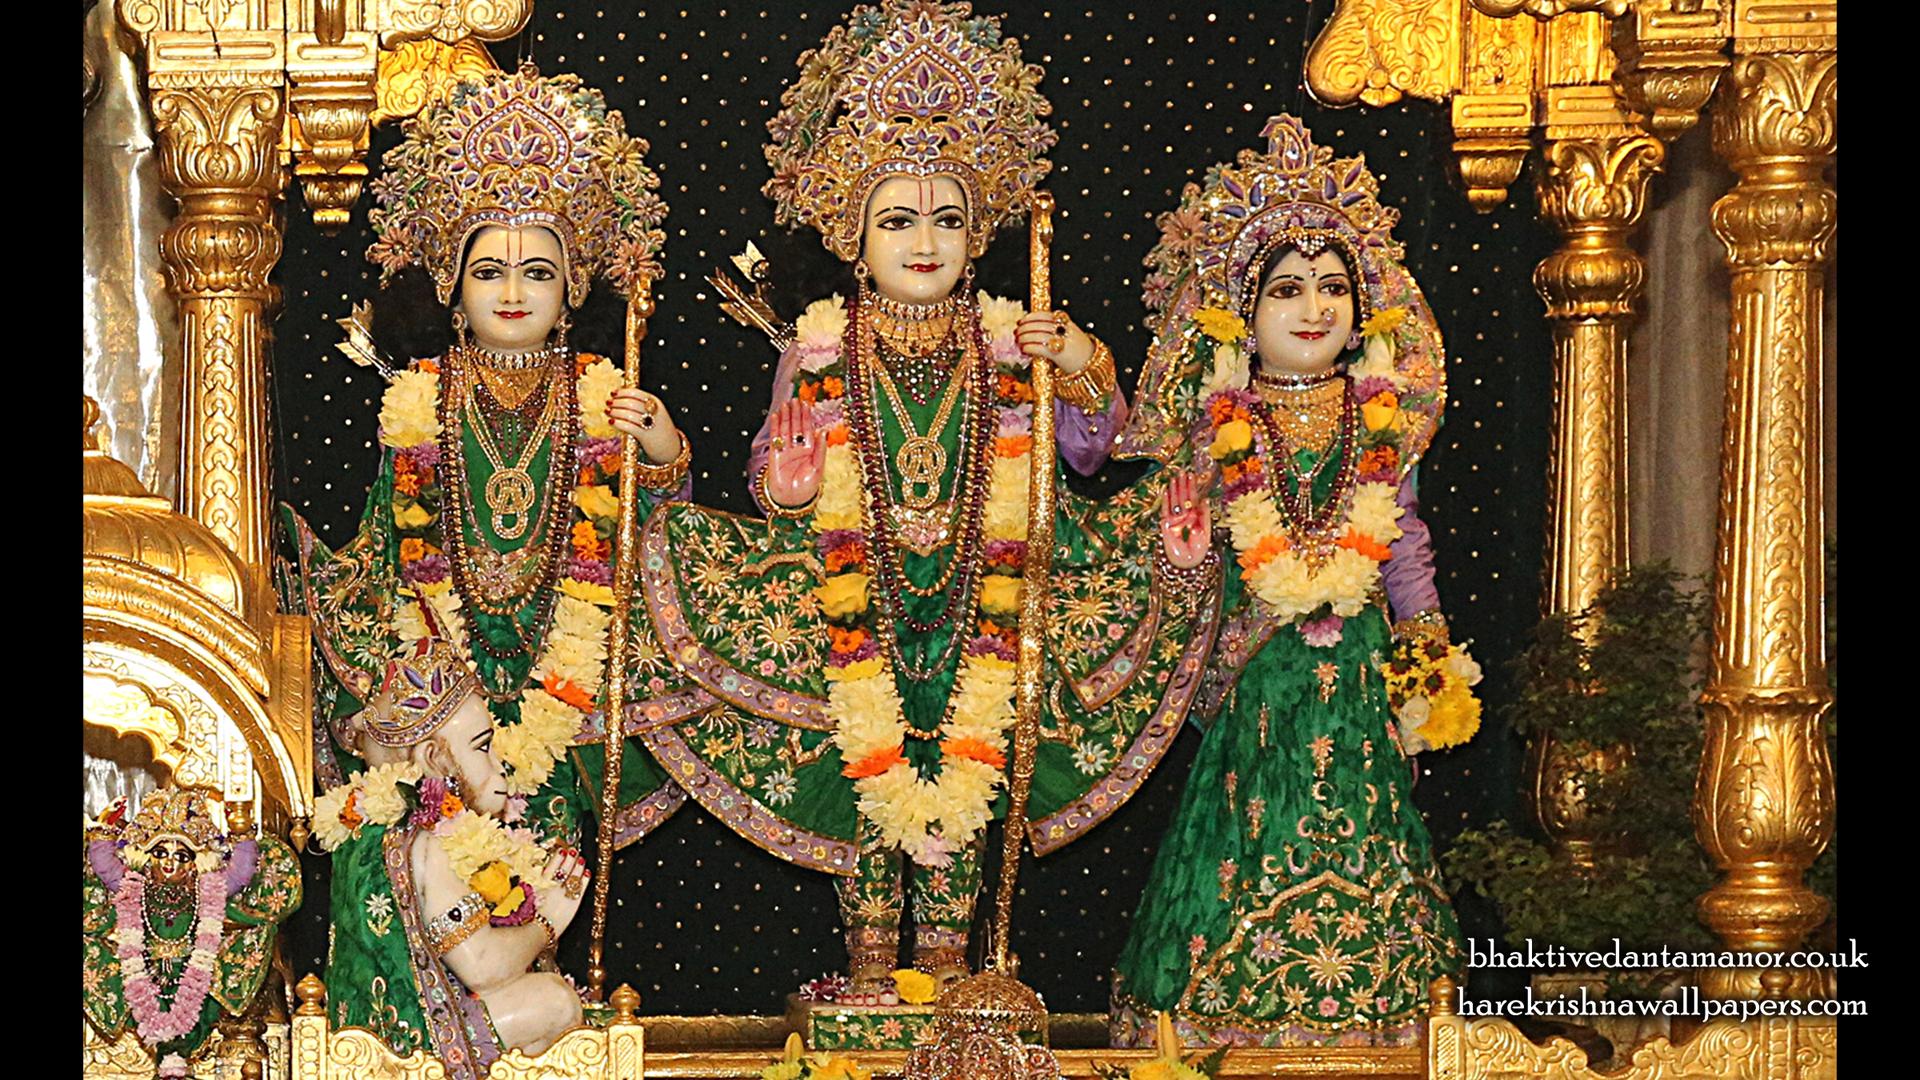 Sri Sri Sita Rama Laxman Hanuman Wallpaper (013) Size 1920x1080 Download